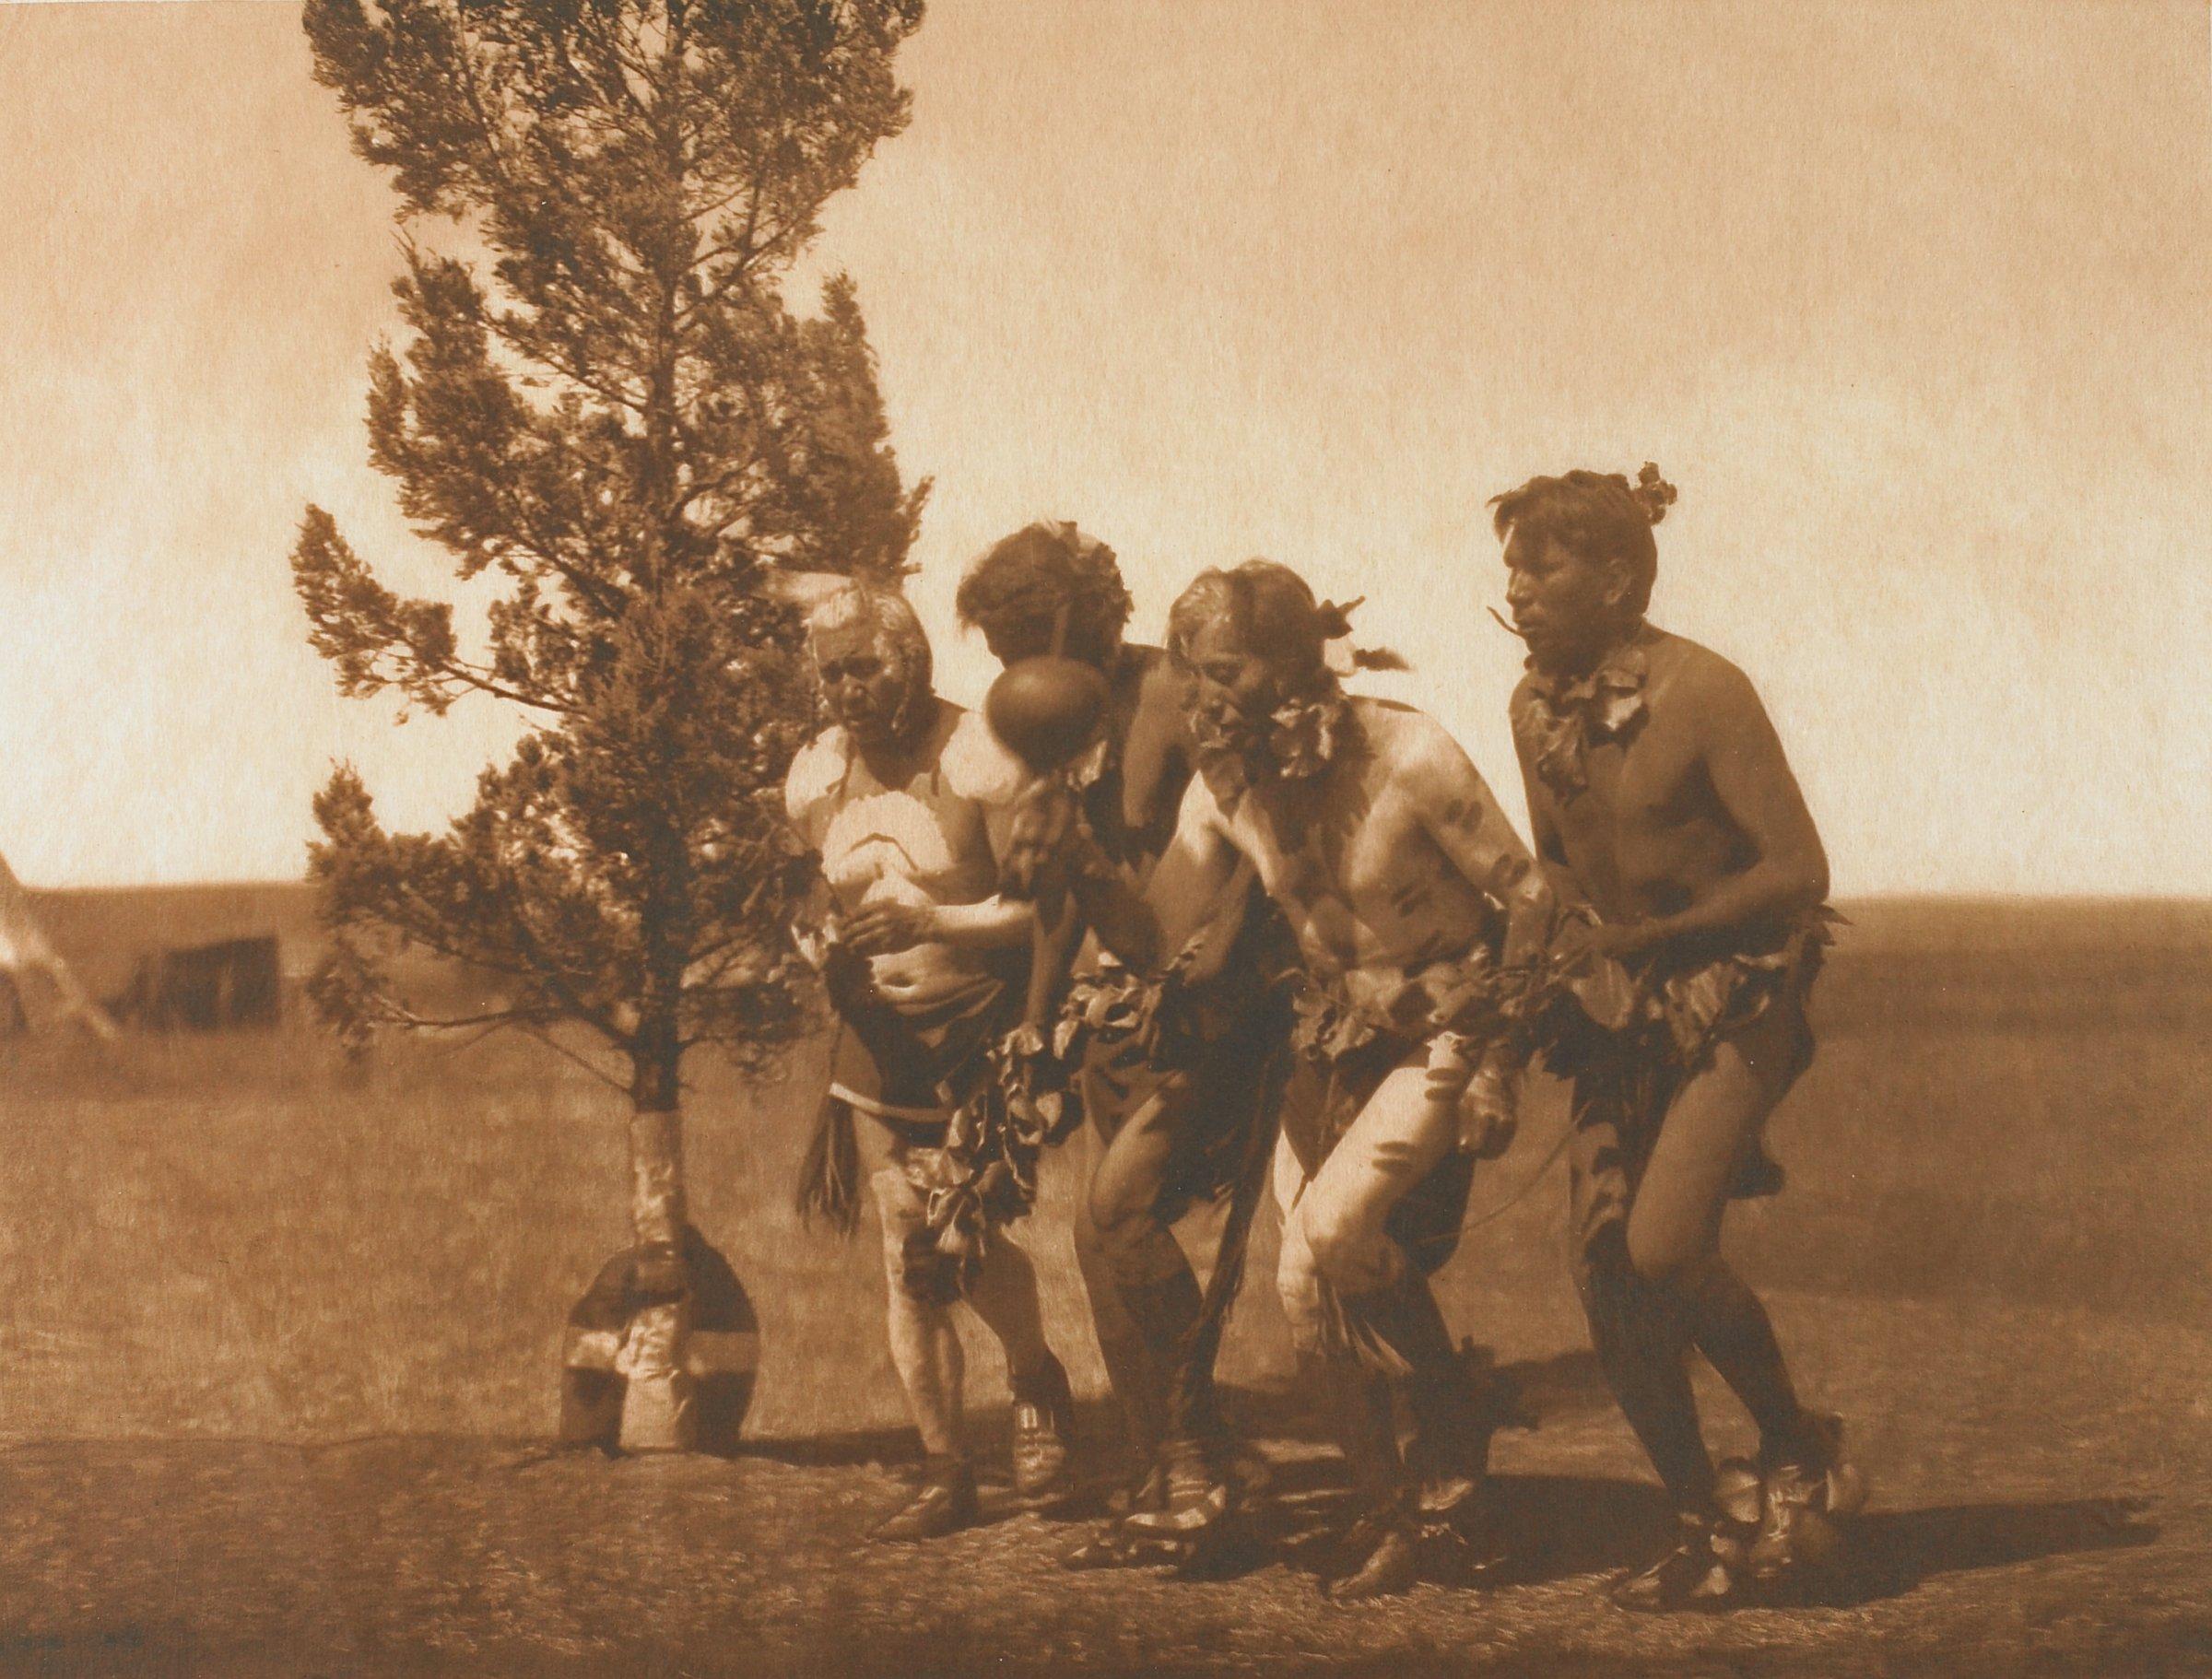 Arikara Medicine Ceremony-Dance of the Black-Tail Deer, Edward Sheriff Curtis, photogravure